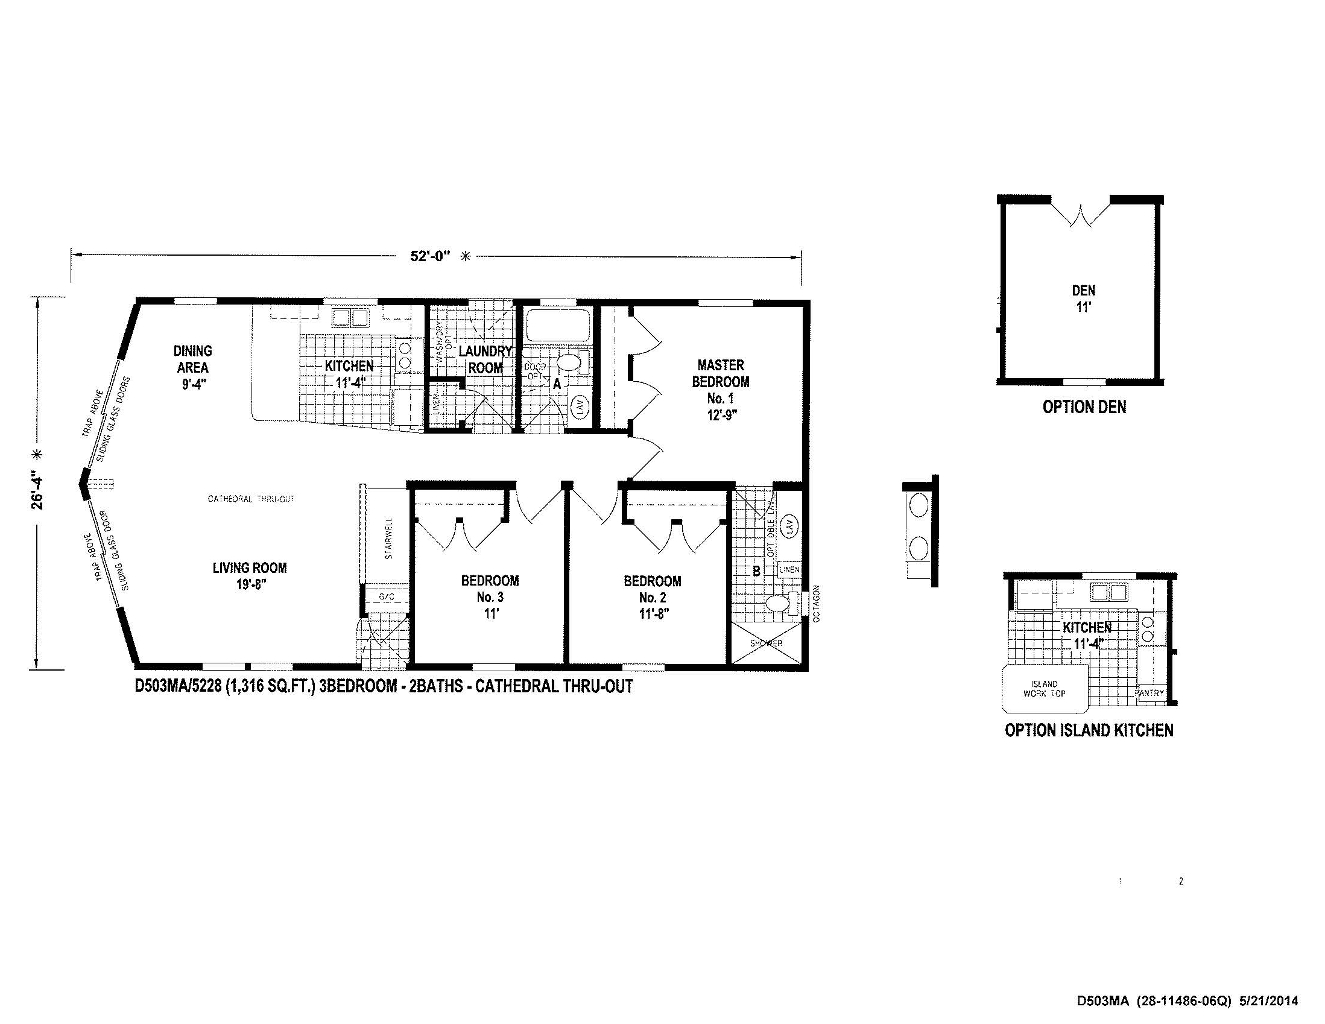 Wood Manor D503MA